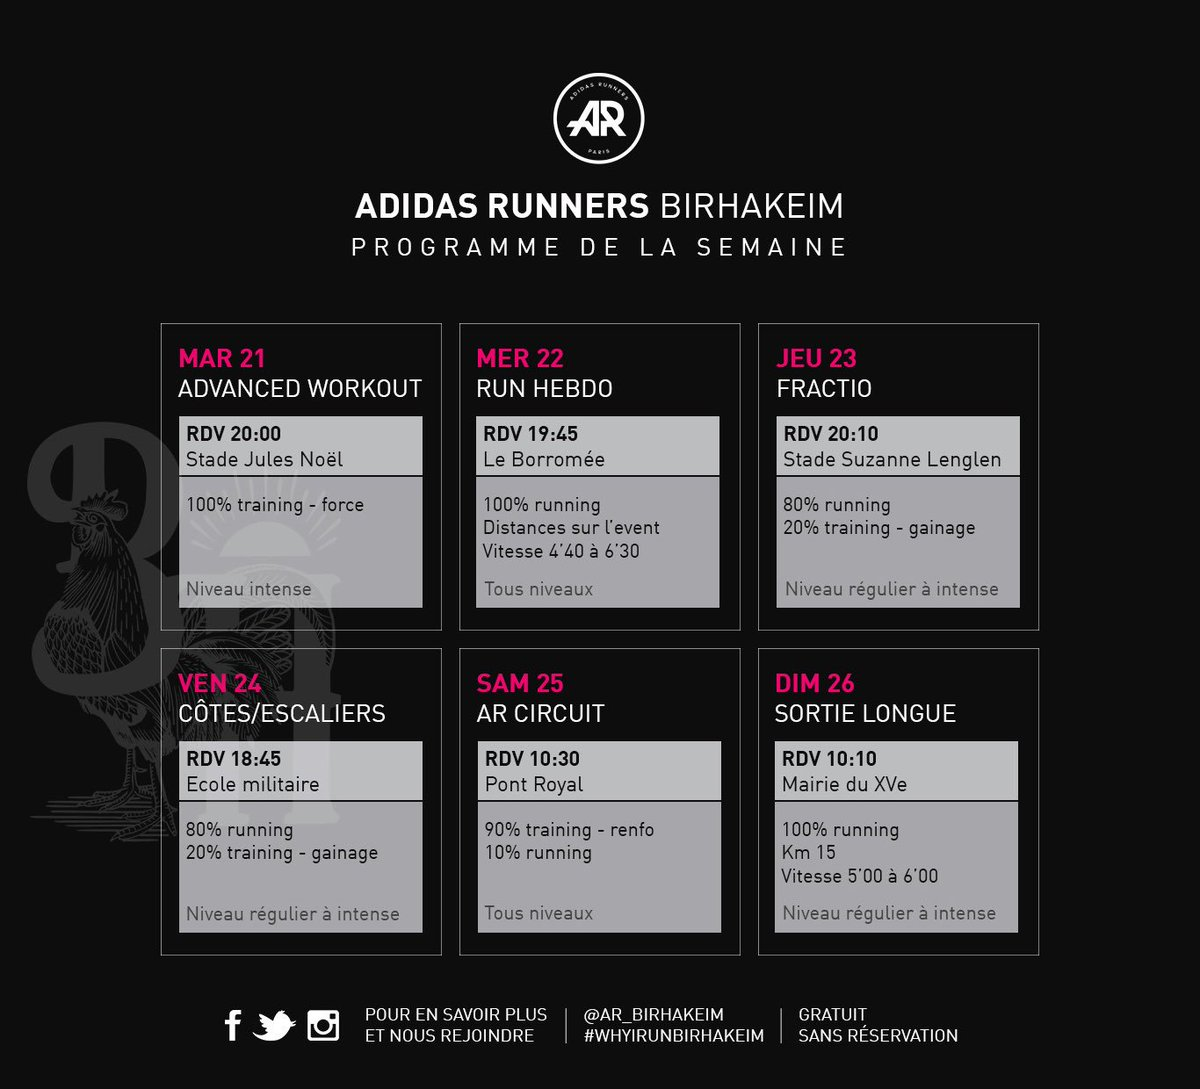 On se voit tous les jours à partir de demain!   #whyirunbirhakeim #planning #sport #training #adidasrunners #whyirunparis<br>http://pic.twitter.com/ZBDmnE9kih